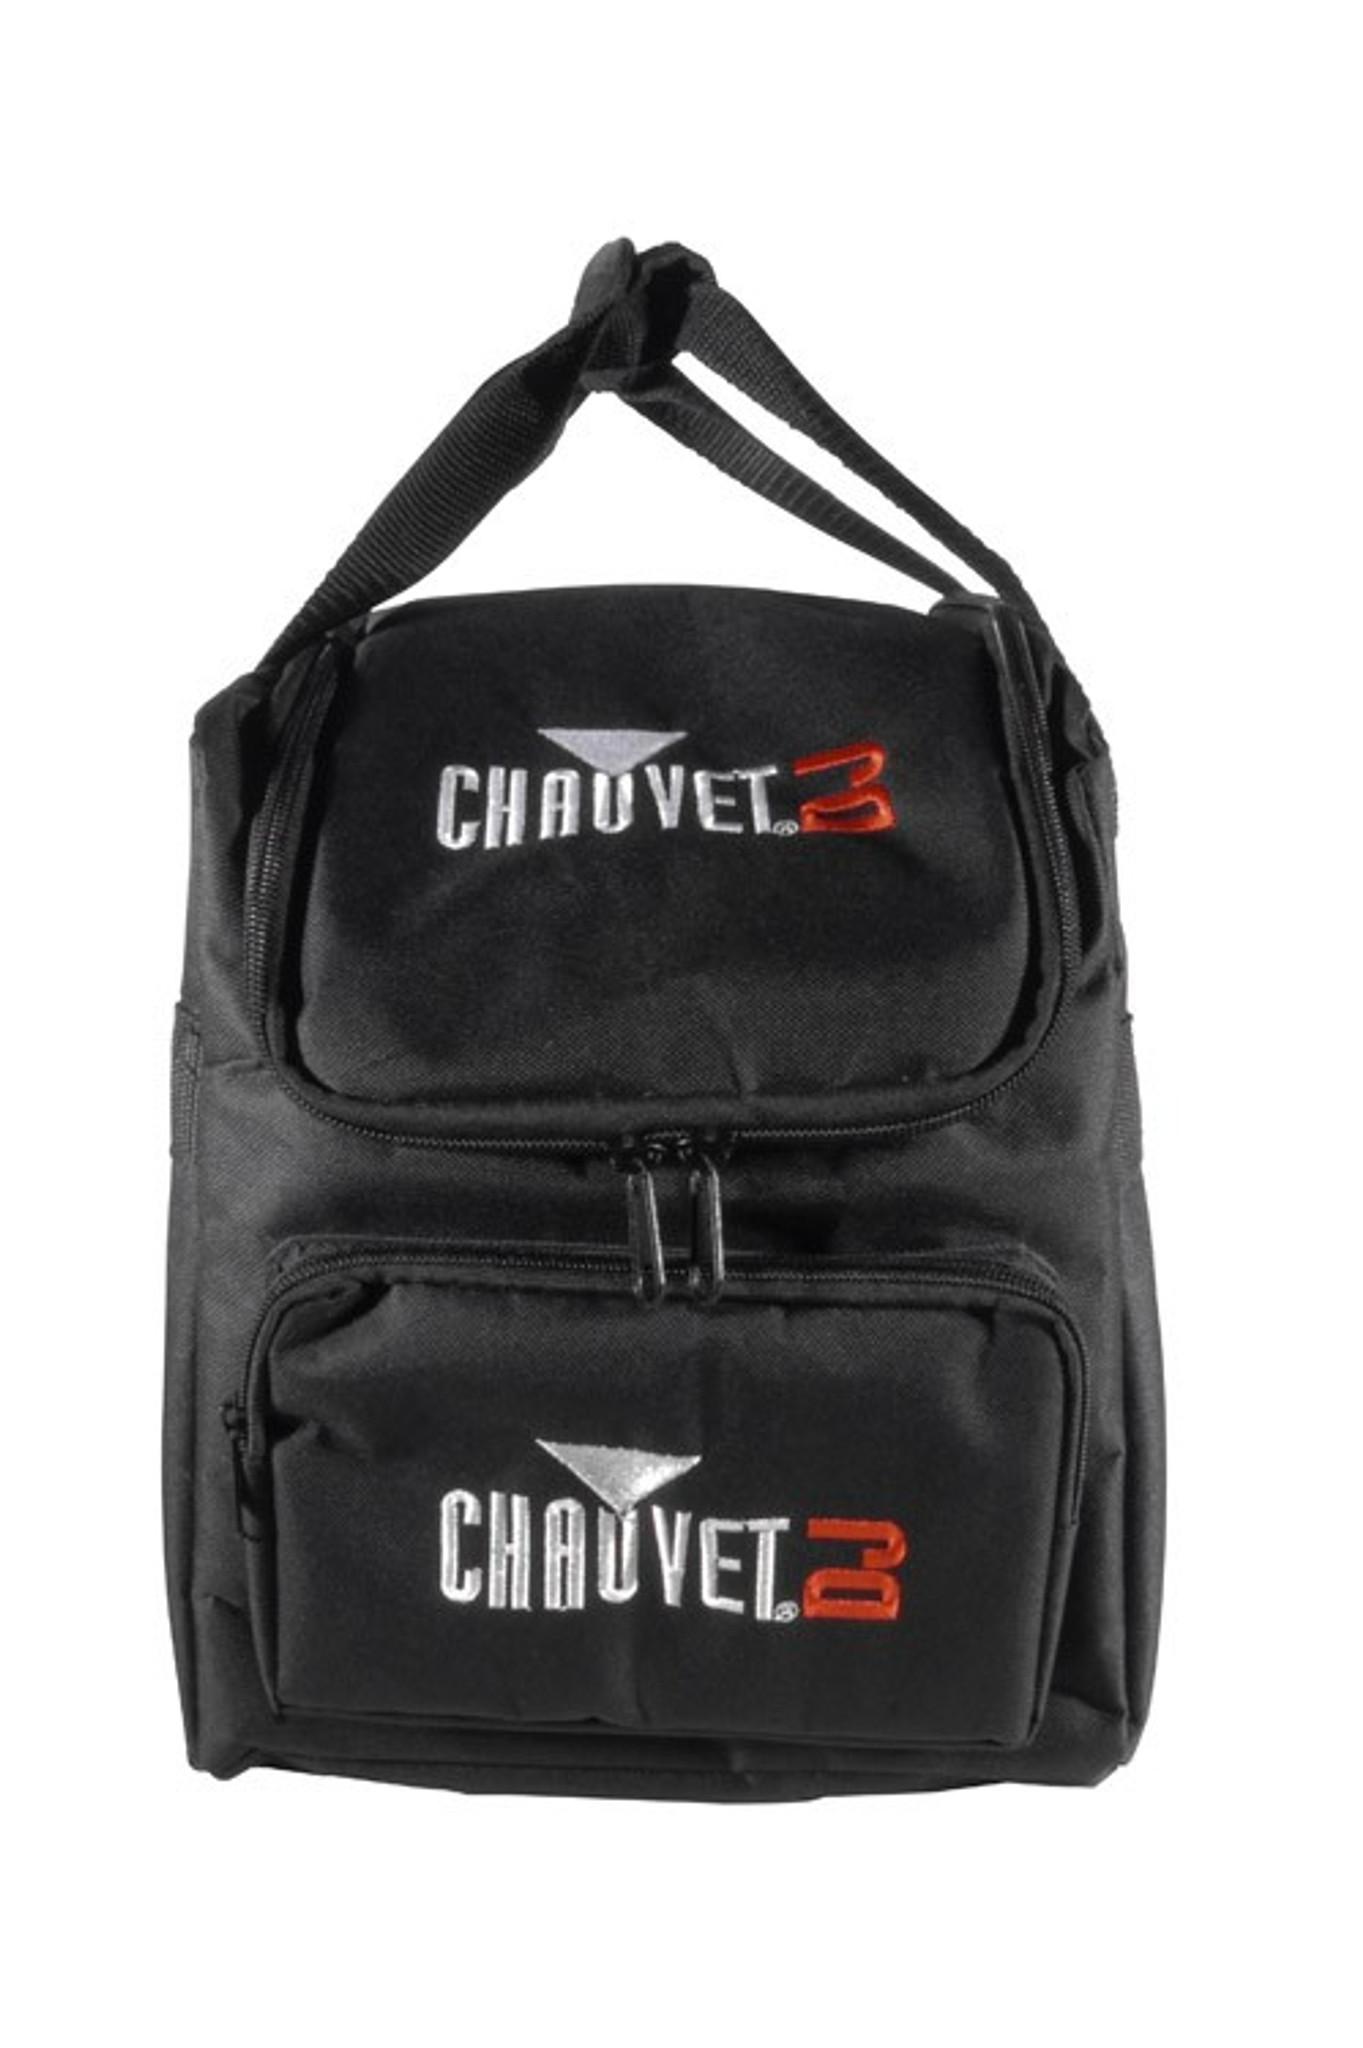 Chauvet CHS-25 VIP Gear Bag For Slimpar64//Slimpar64RGBA